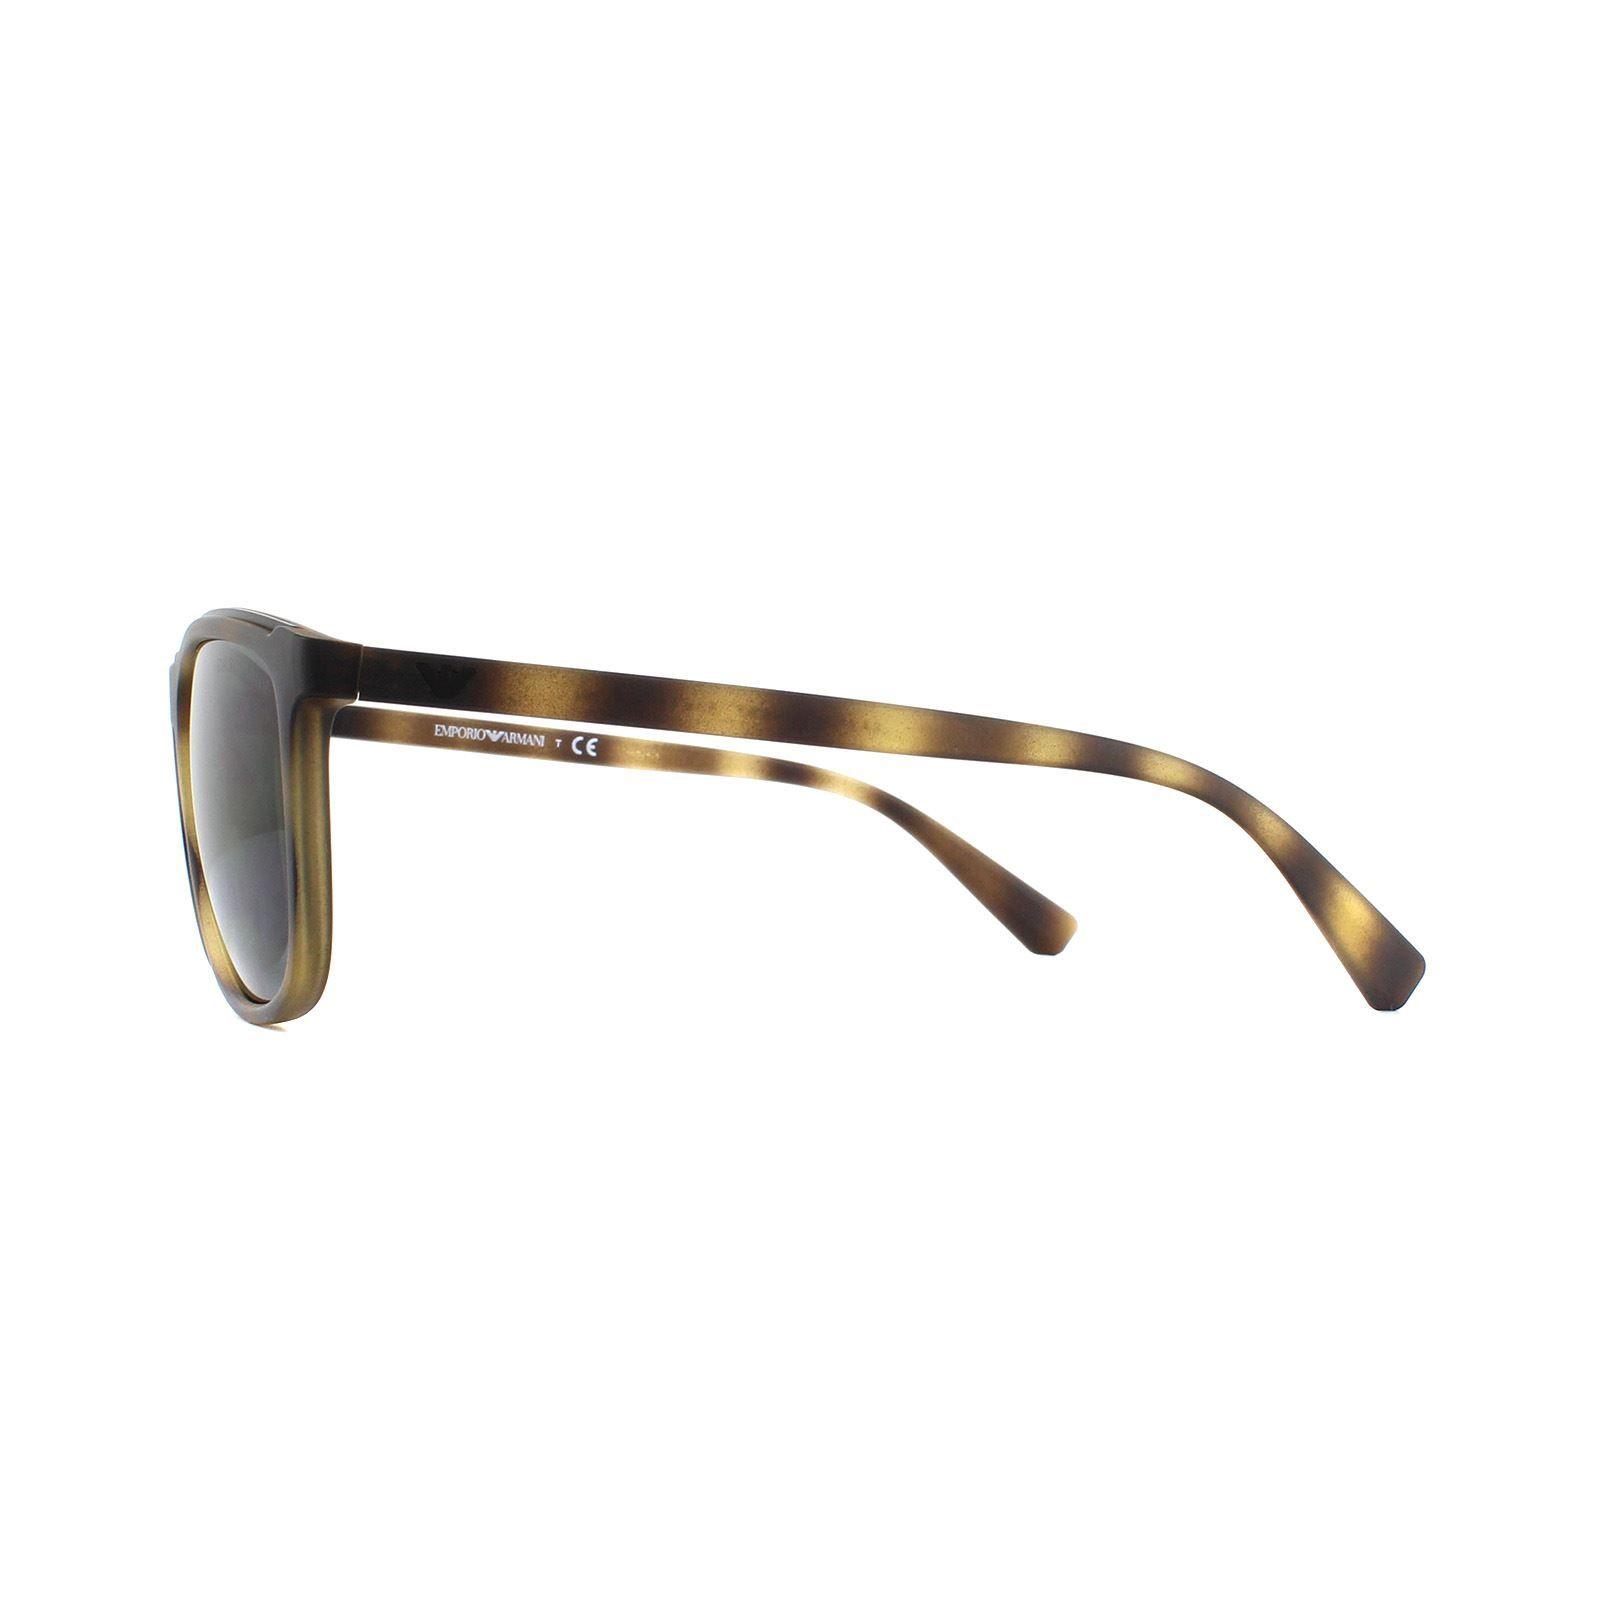 Emporio Armani Sunglasses EA4109 508987 Matte Havana  Grey